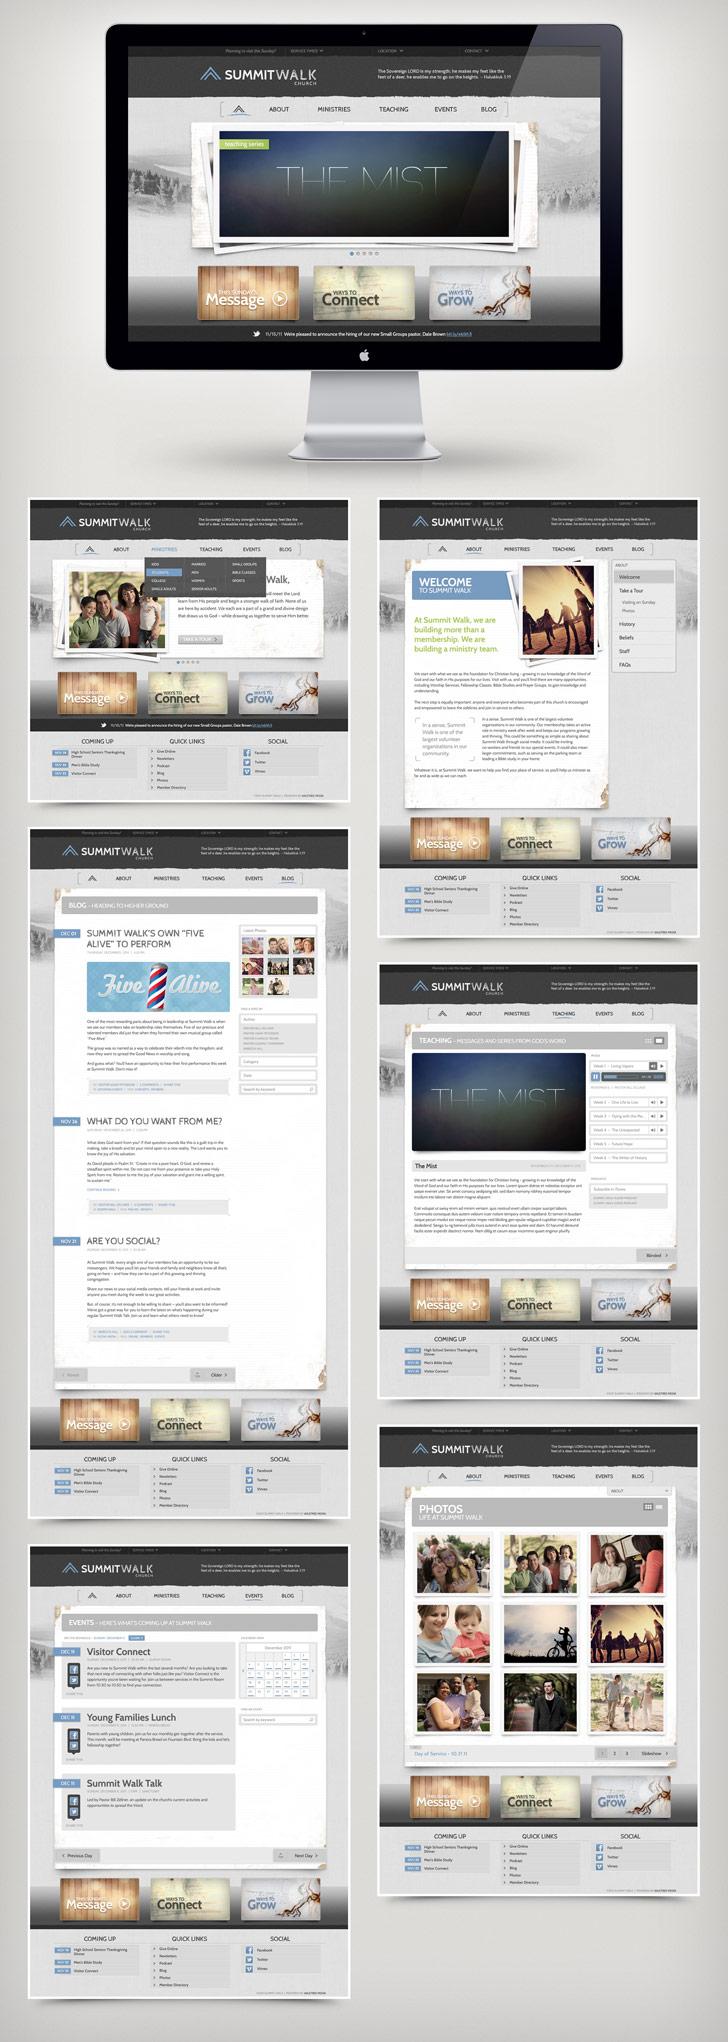 2a7a0-thrive_summitwalk_web_display.jpg